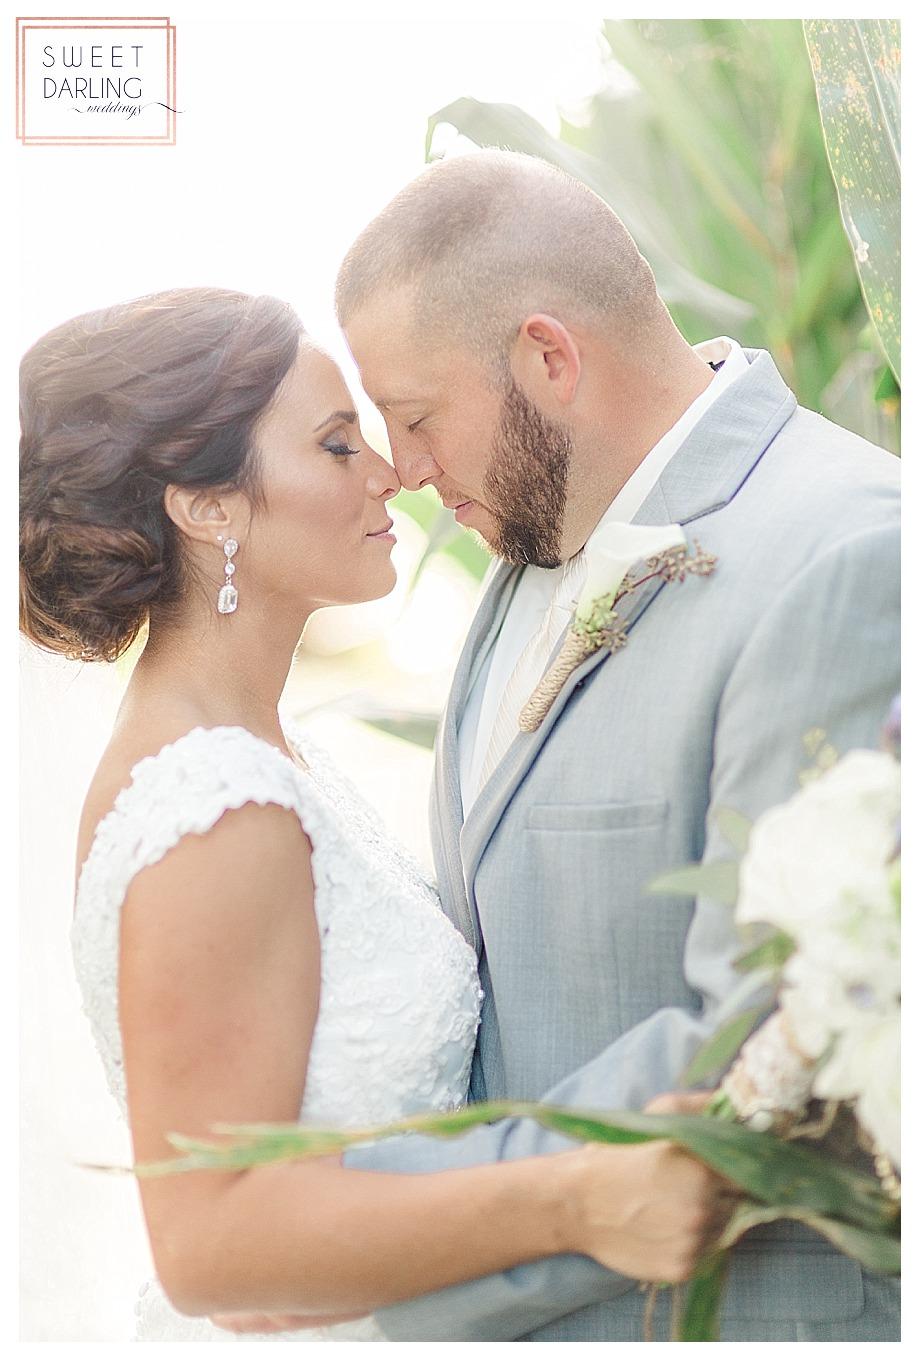 elegant-country-barn-wedding-hudson-farm-urbana-illinois-sweet-darling-weddings-photography_0692